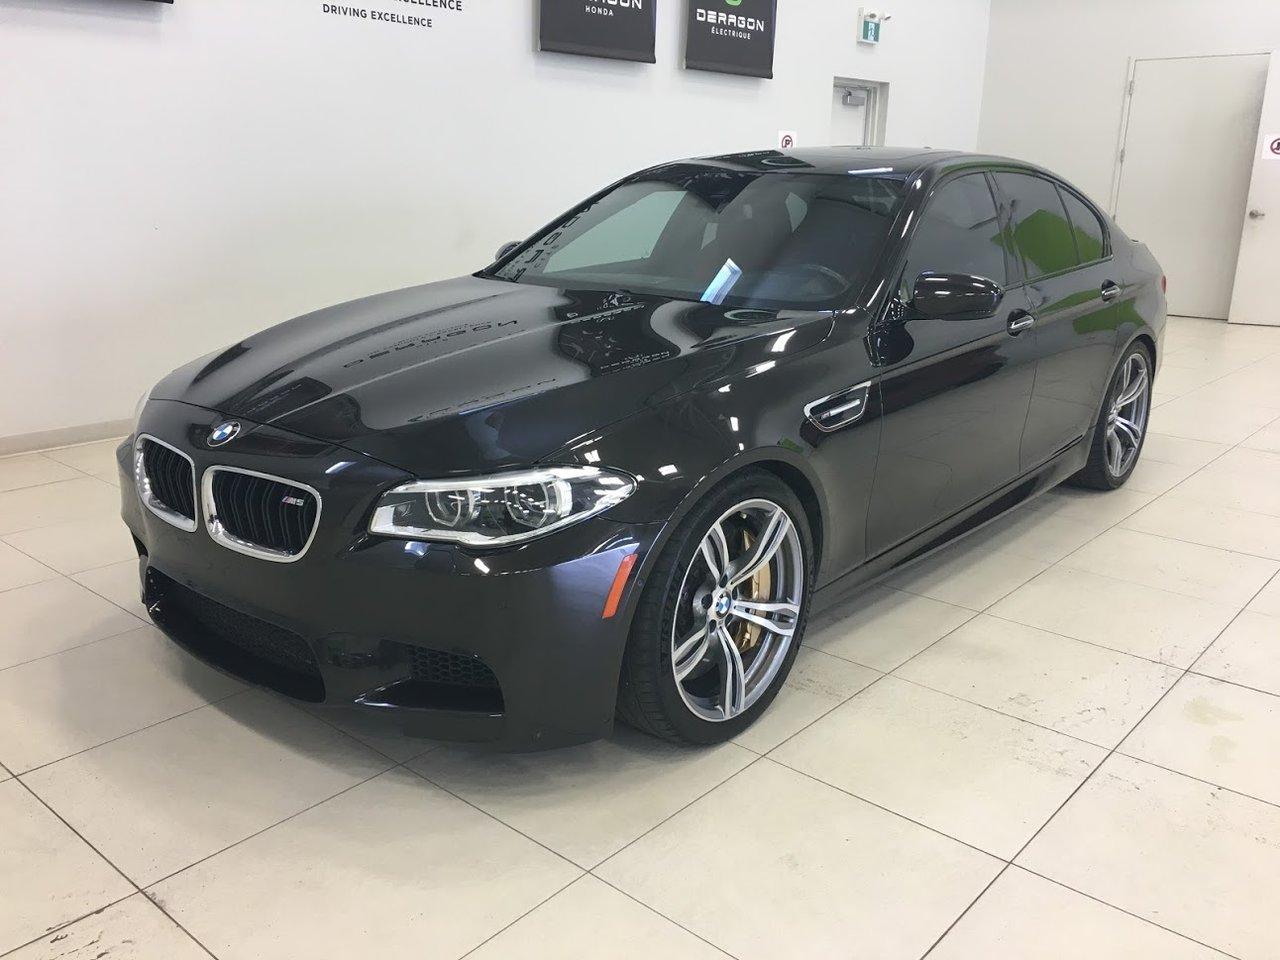 2016 BMW  M5 ULTIMATE CARBON BRAKE, 560HP, MERINO LEATHER